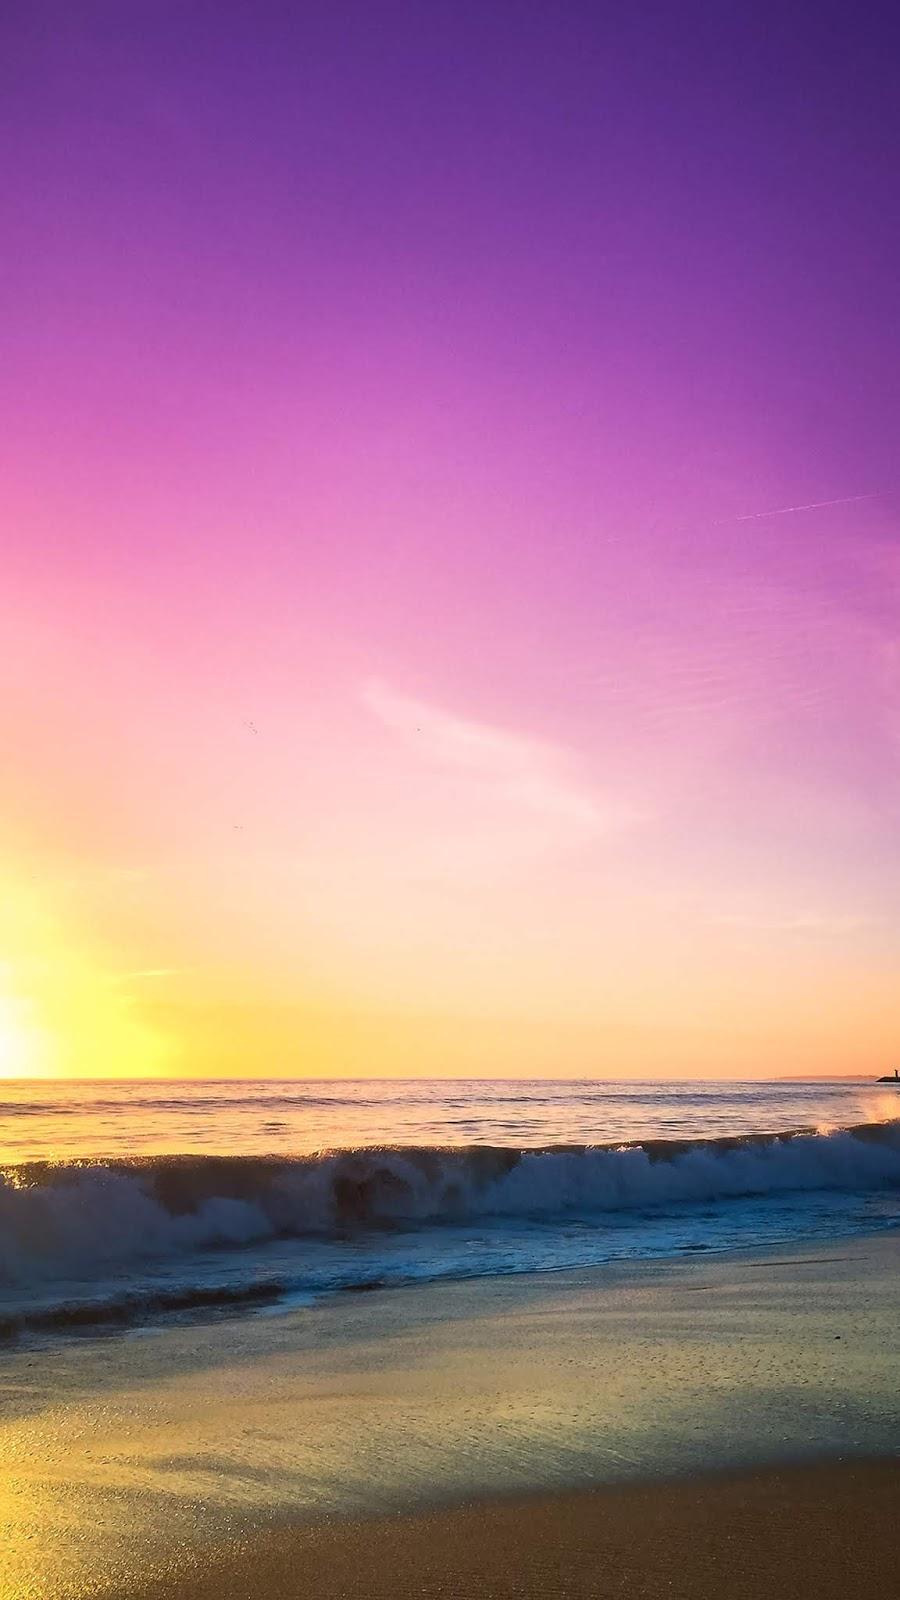 Beach in the twilight